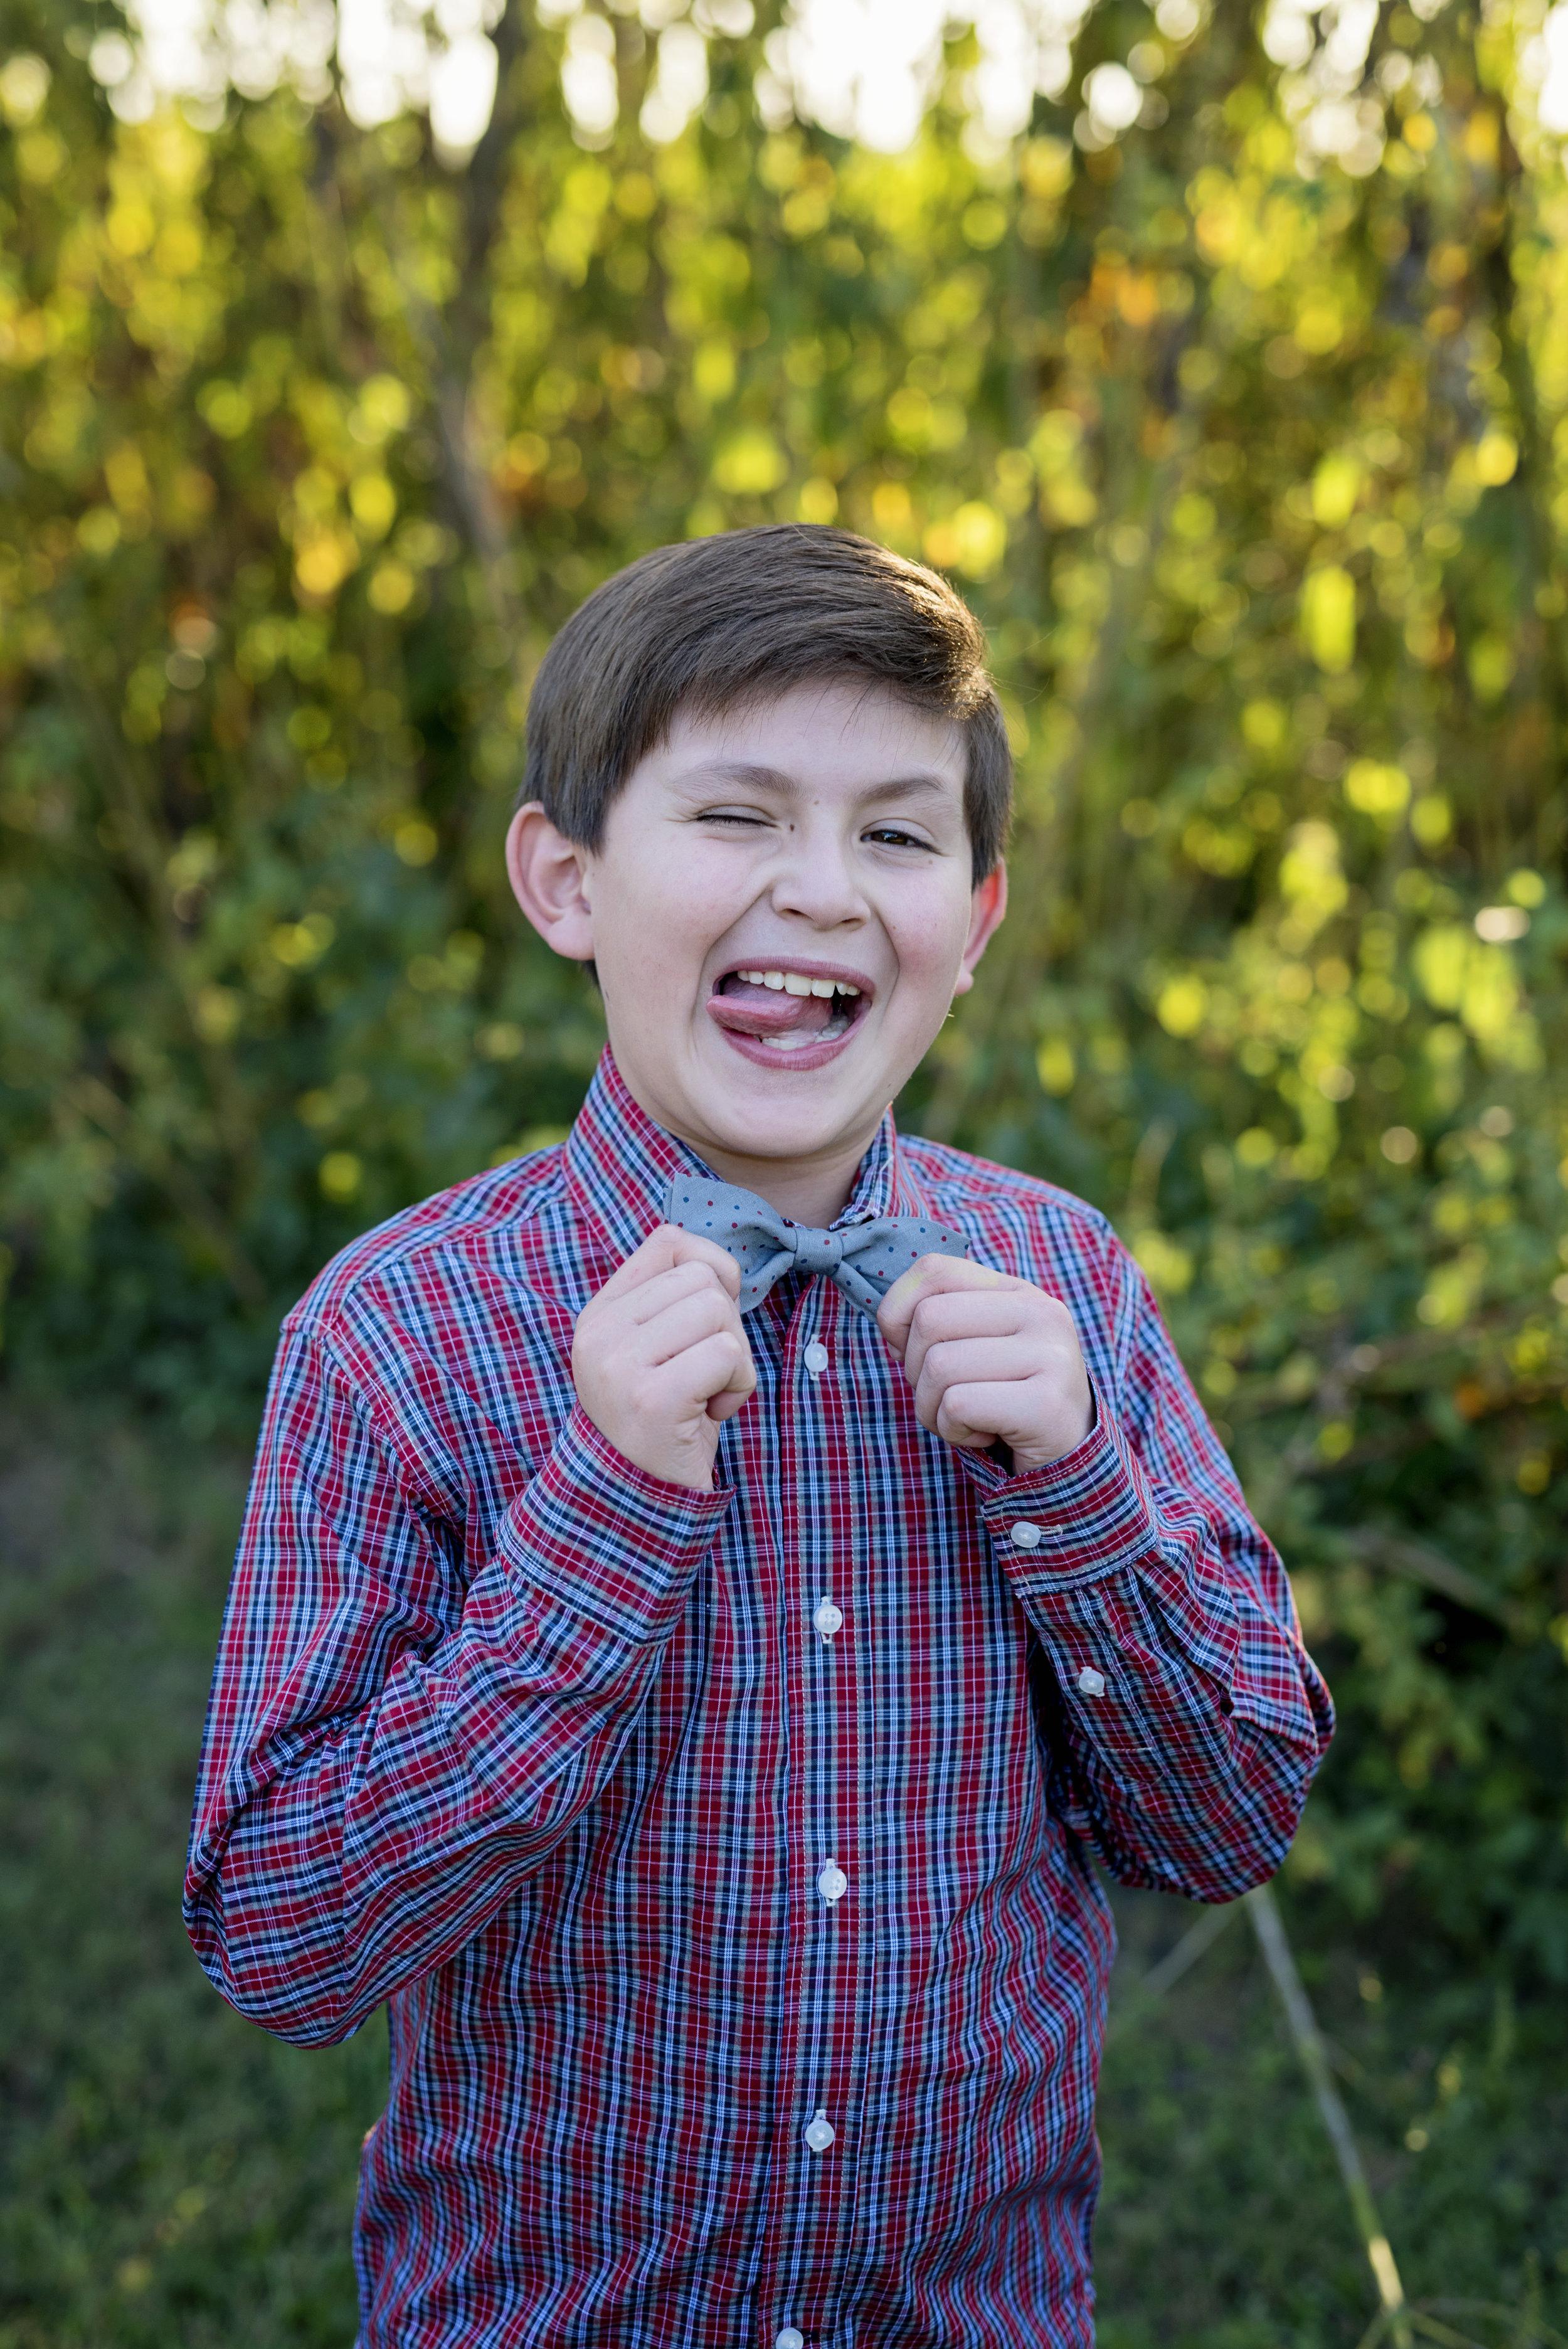 10 year old boy, bowtie photos